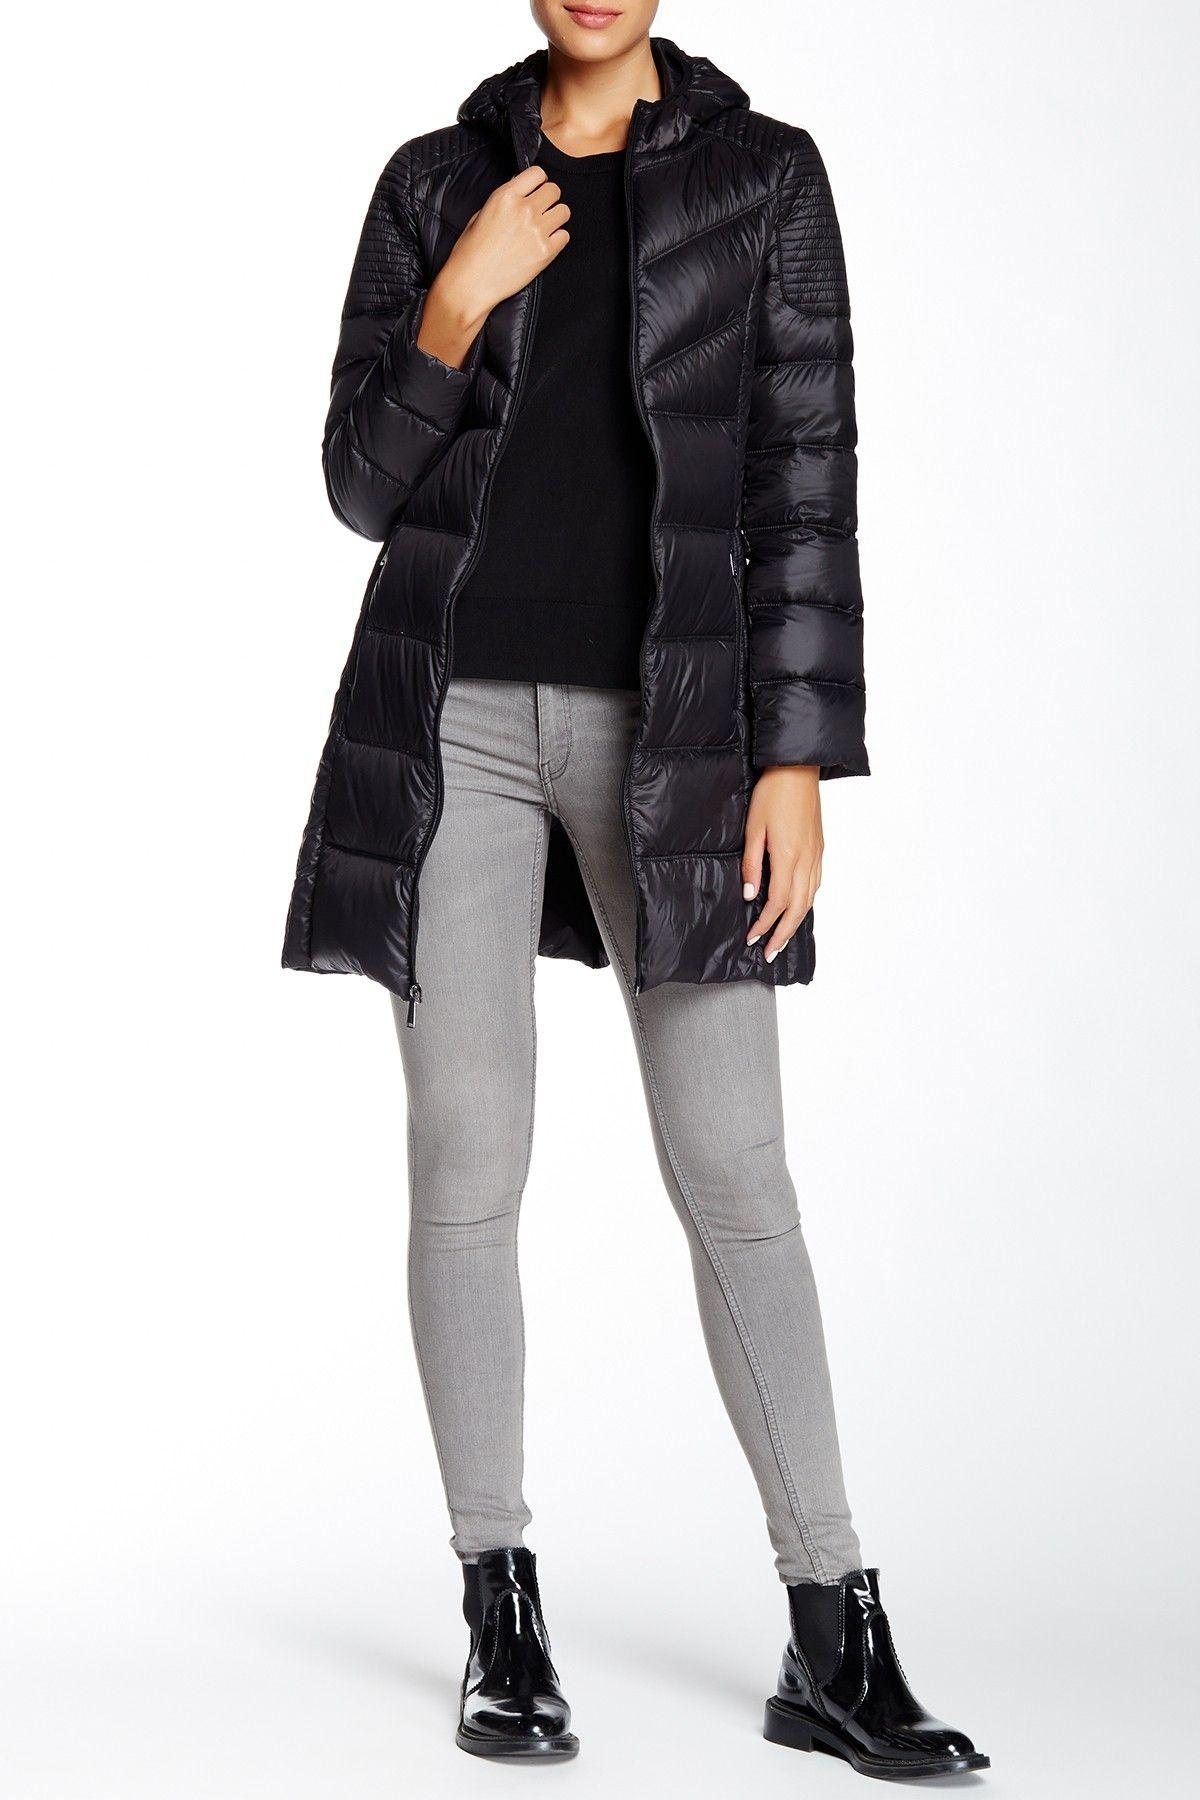 Bcbgeneration Missy Packable Hooded Jacket Nordstrom Rack Jackets Hooded Jacket Women S Puffer [ 1800 x 1200 Pixel ]